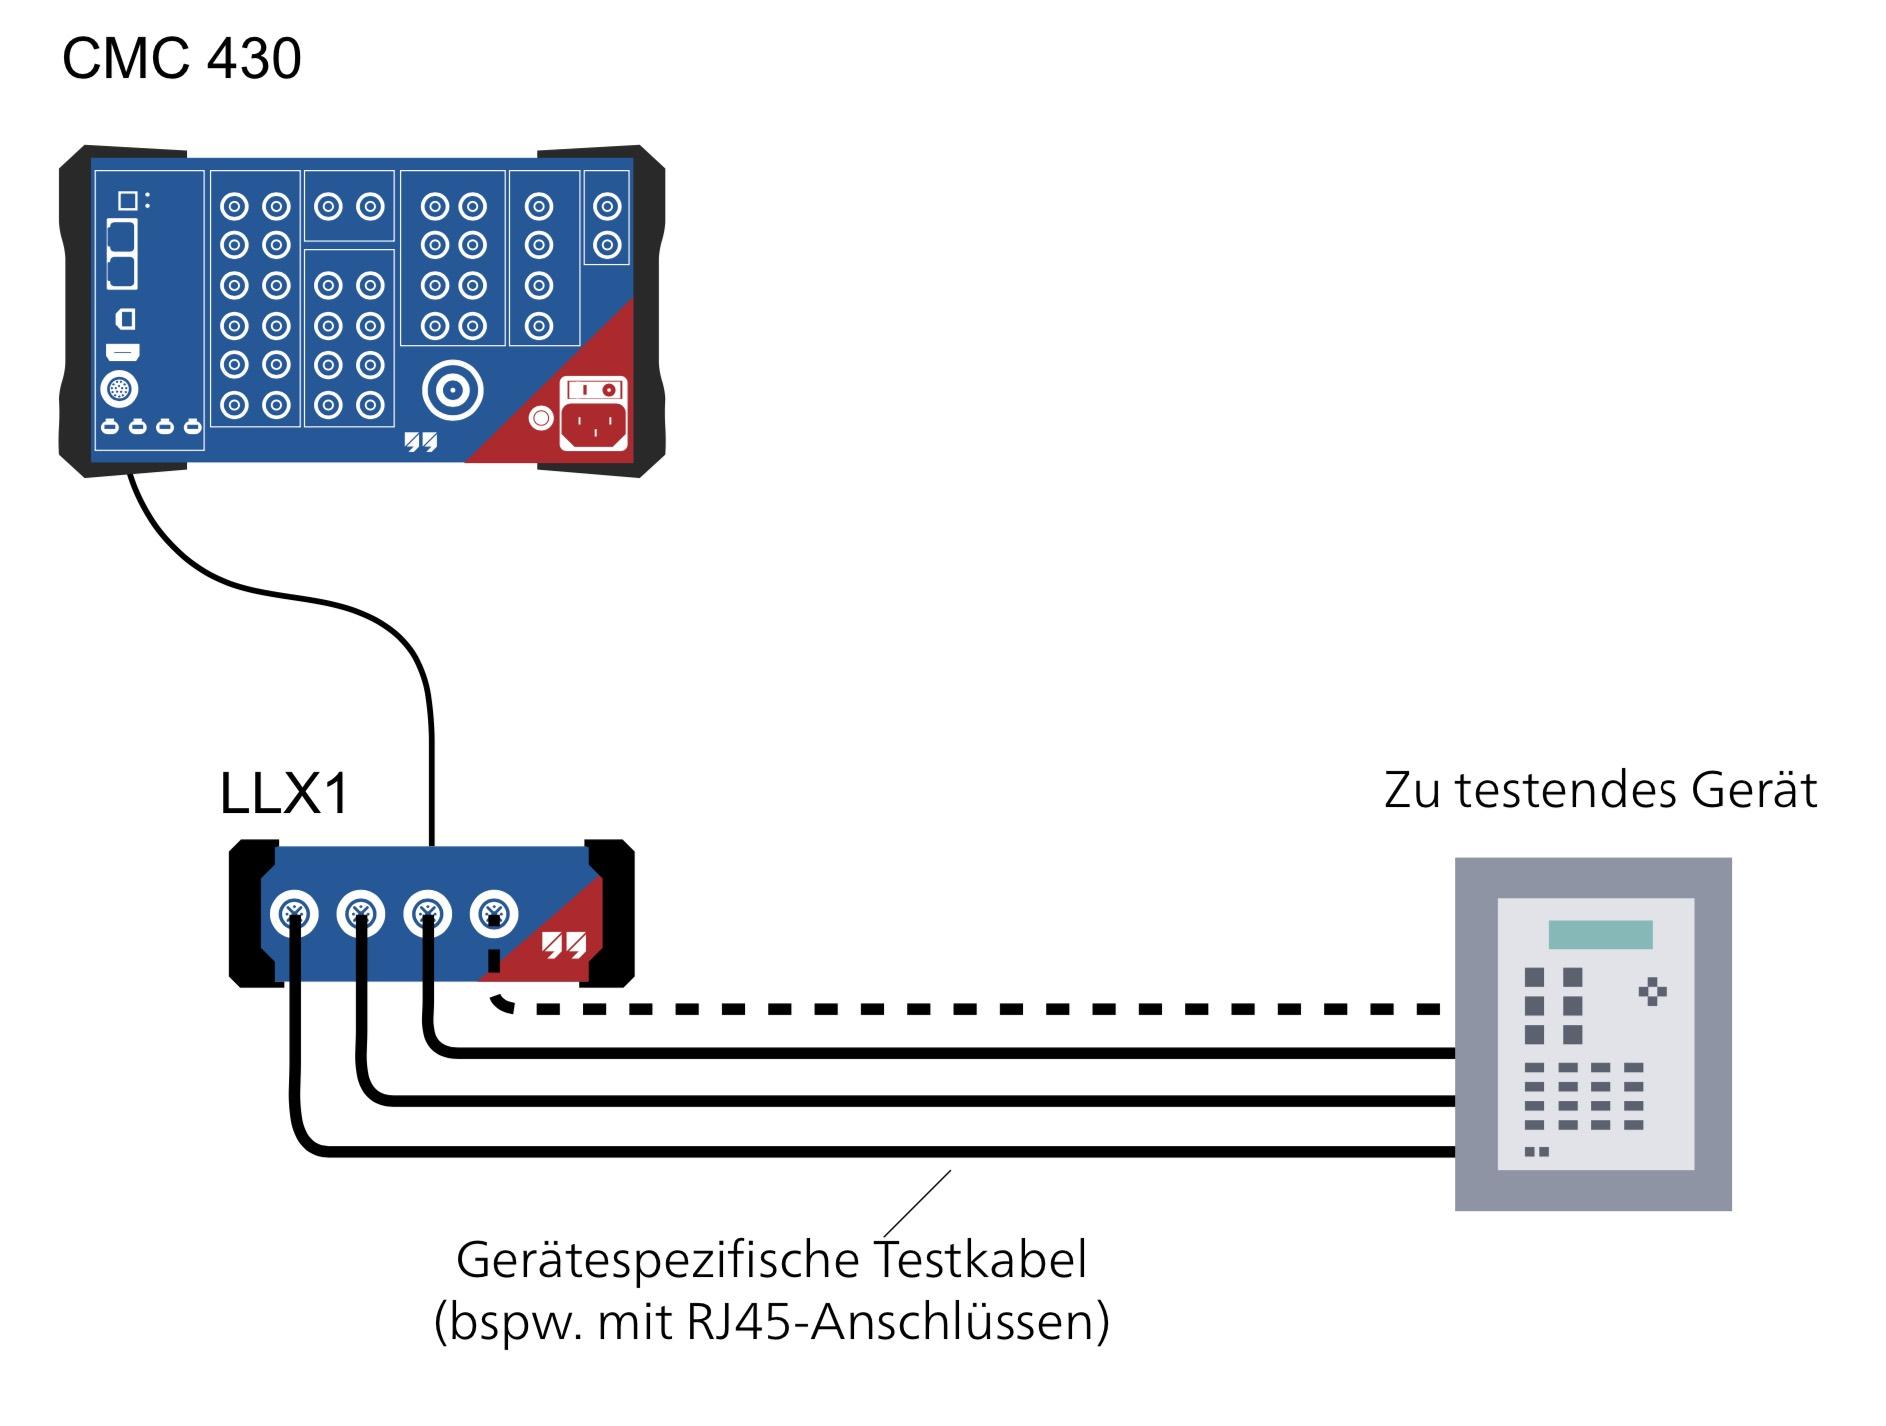 LLX1, Omicron, Prüfung, Rogowski, Nicht-Konventionell